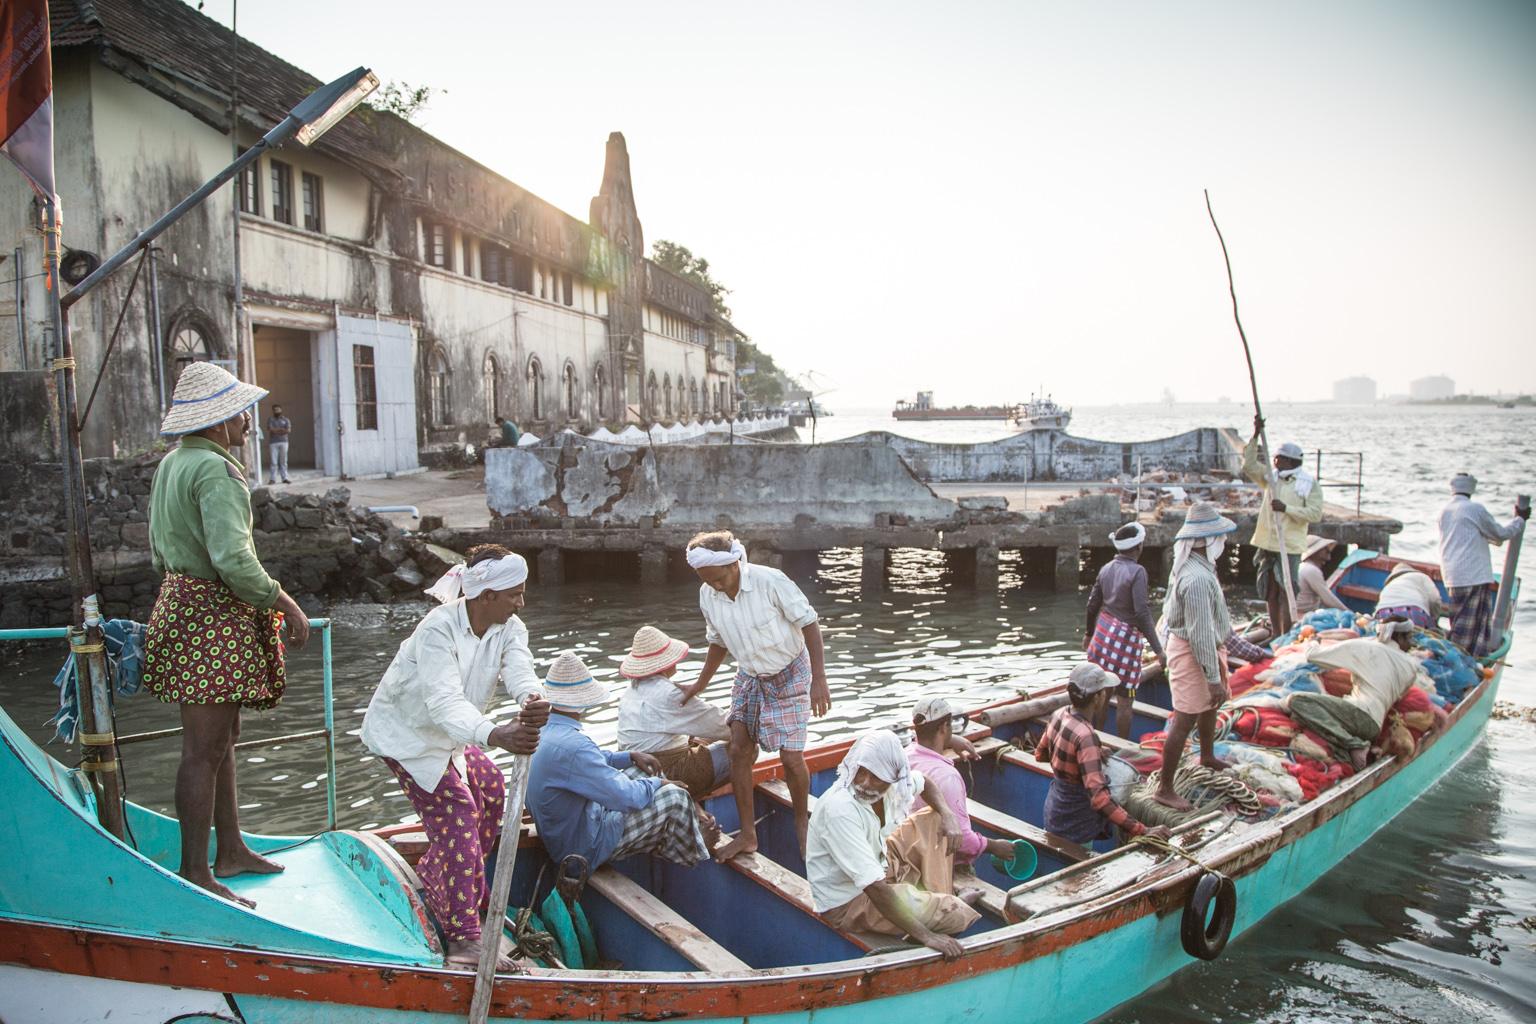 Matteo-Vegetti-blog-fishermen-of-Kerala-6623